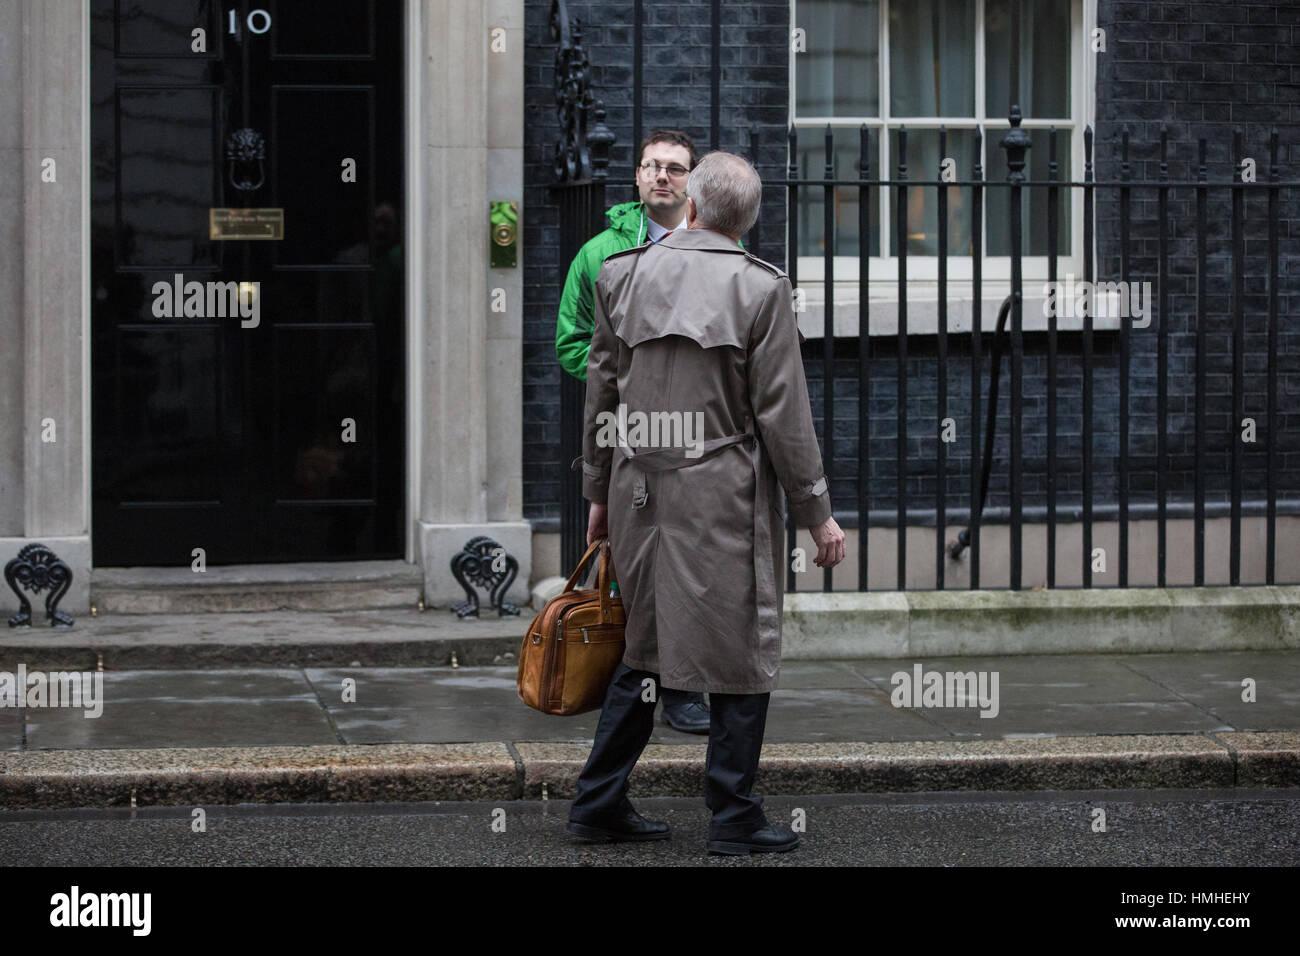 London, UK. 31st January, 2017. Myron Ebell, who led President Trump's Environmental Protection Agency transition Stock Photo